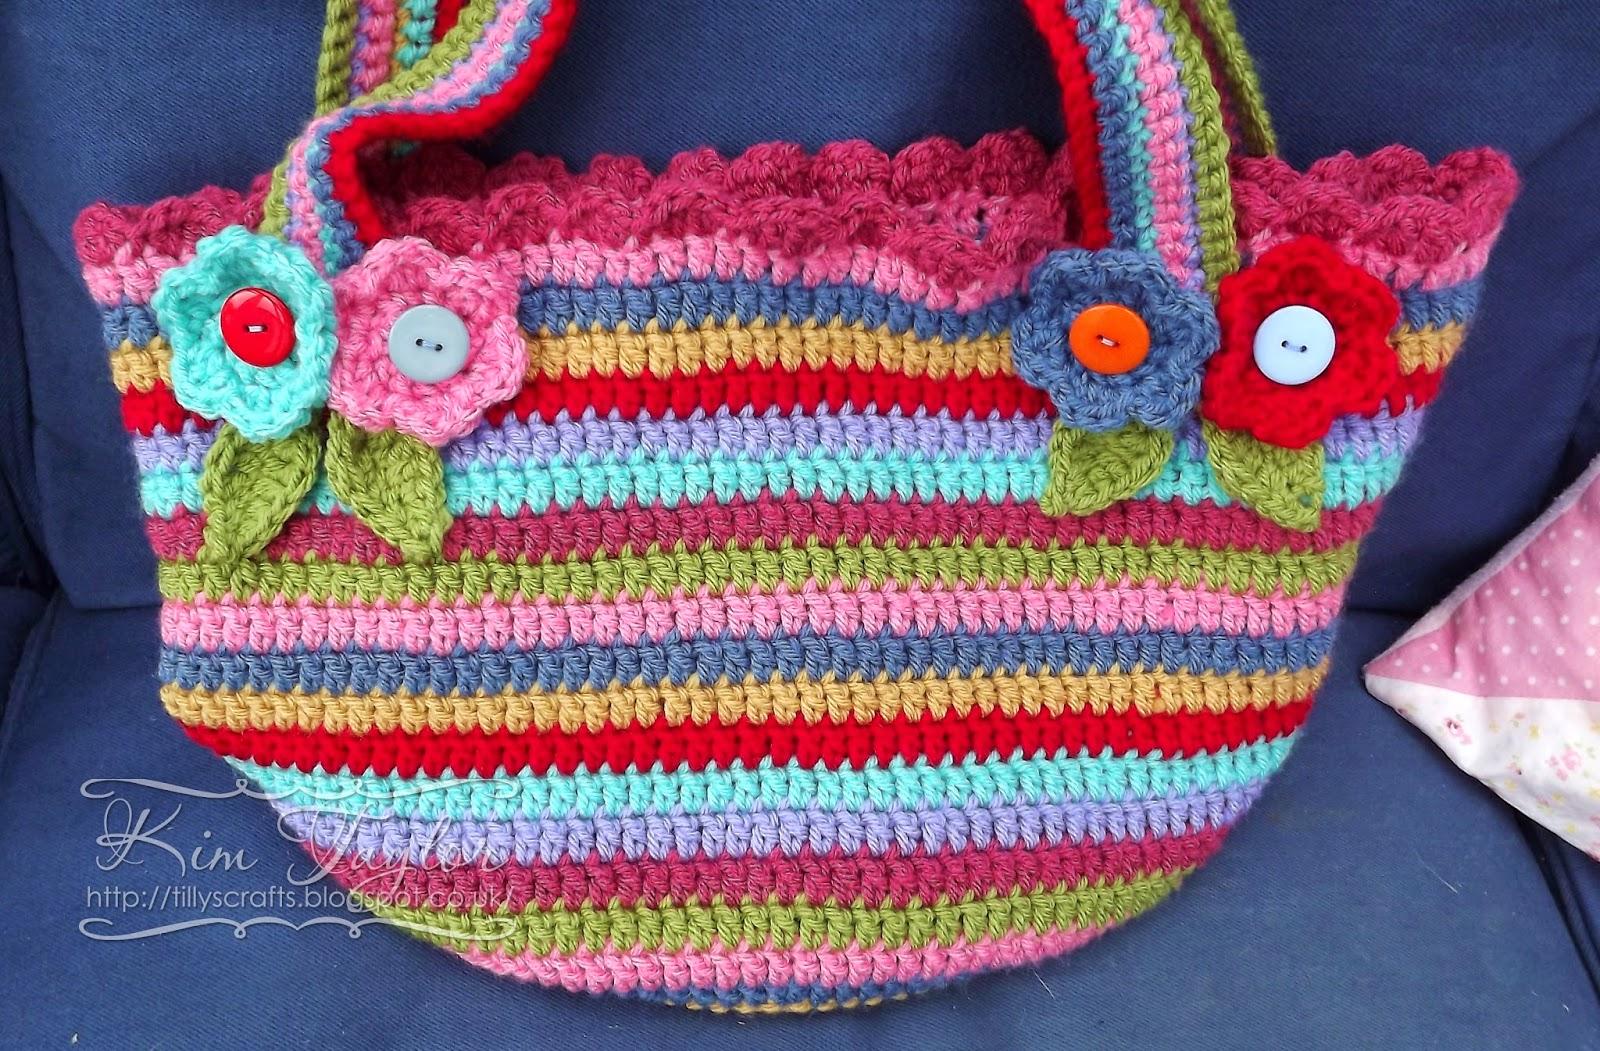 Tillys Crafts: Chunky Crochet Bag!